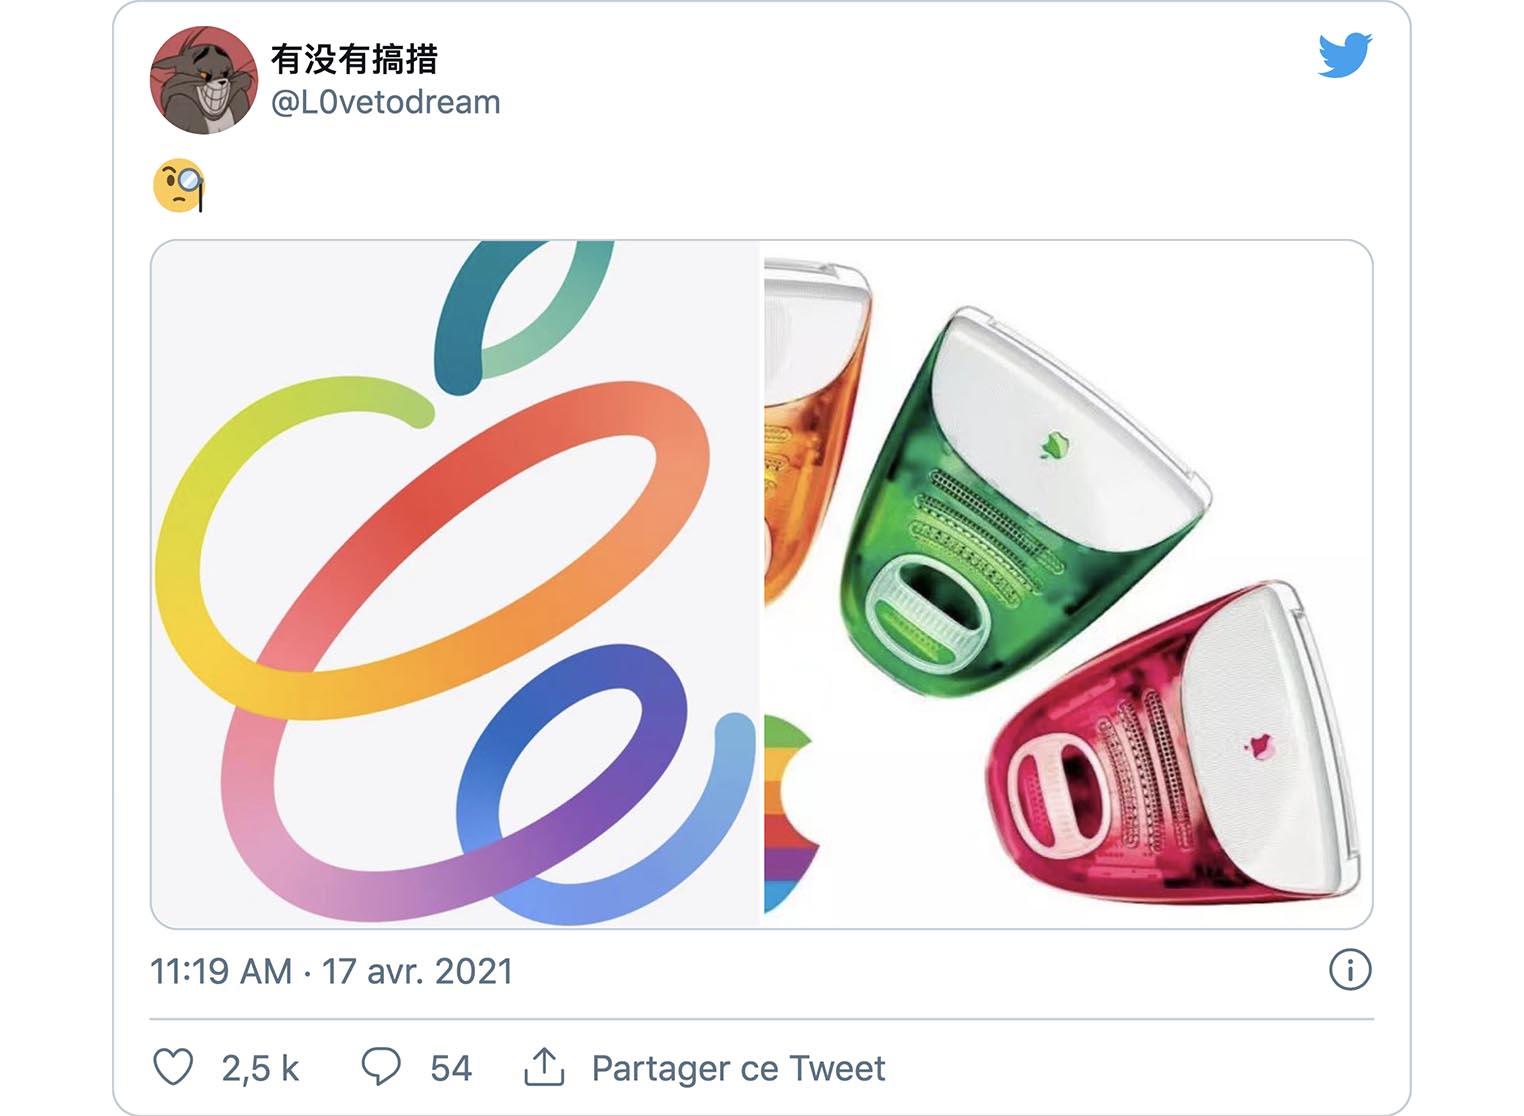 iMac tweet L0vetodream